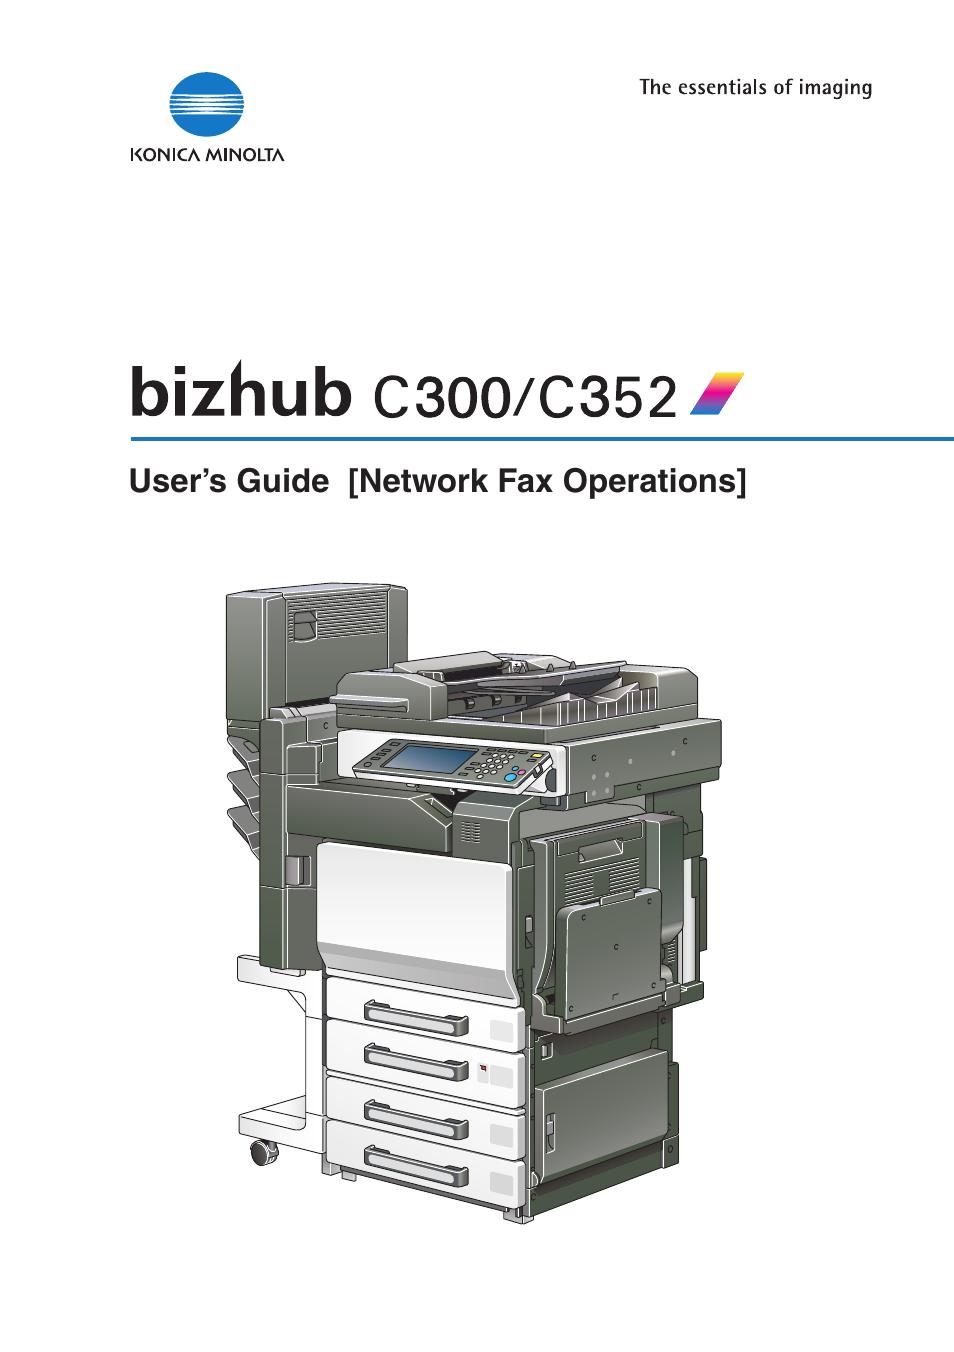 bizhub c300 manual product user guide instruction u2022 rh testdpc co Konica Minolta Copiers Konica Minolta Logo